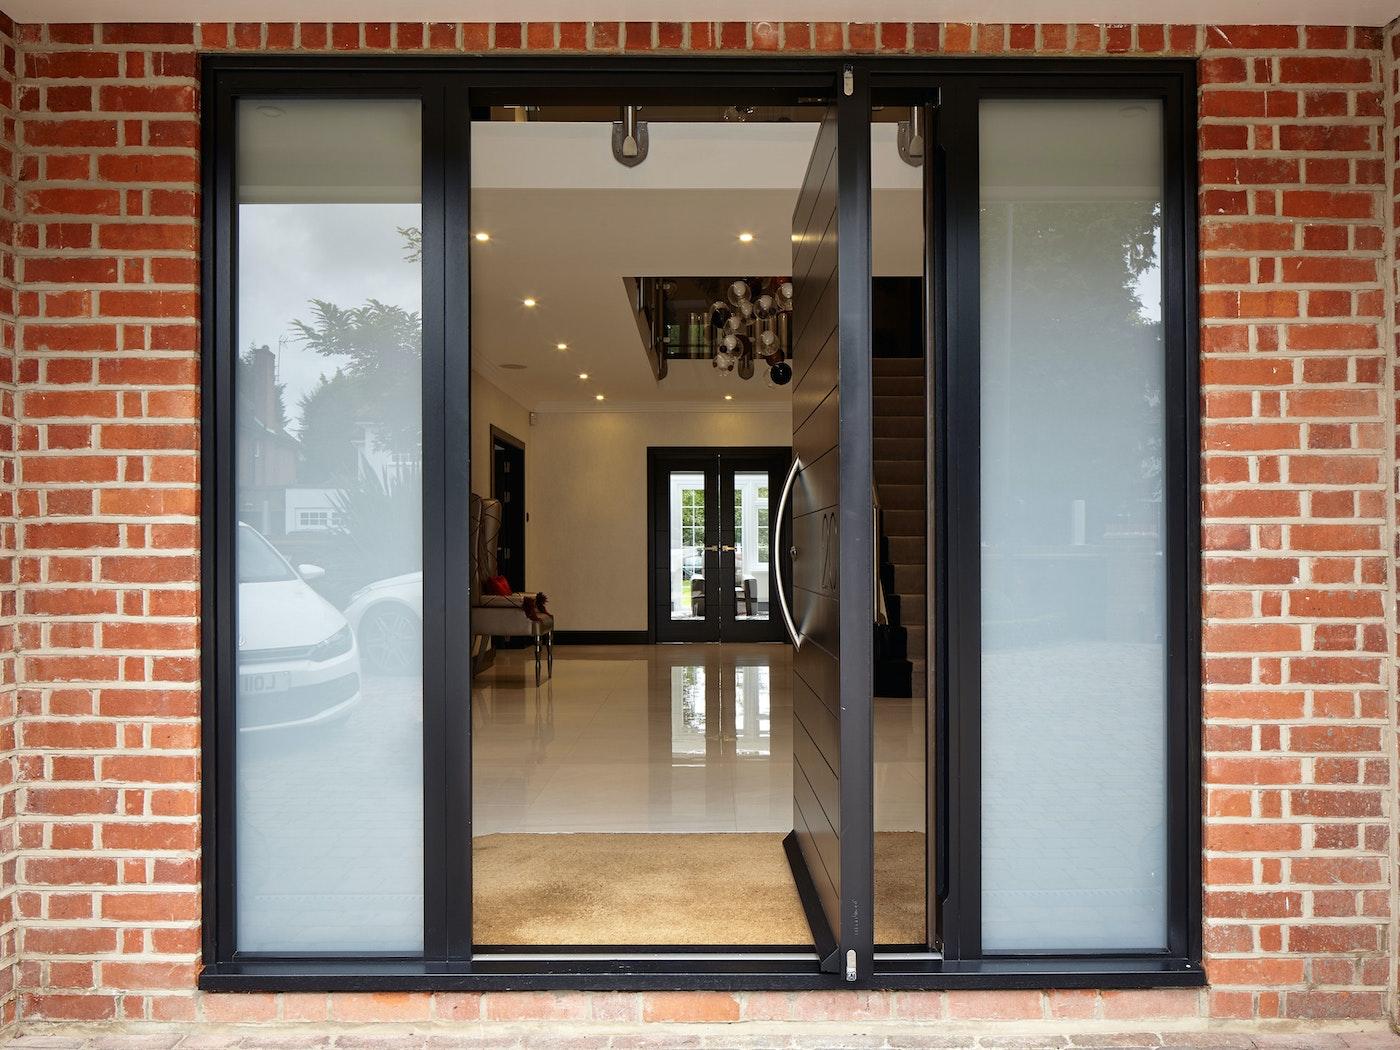 Sandblasted glass side panels add extra interest